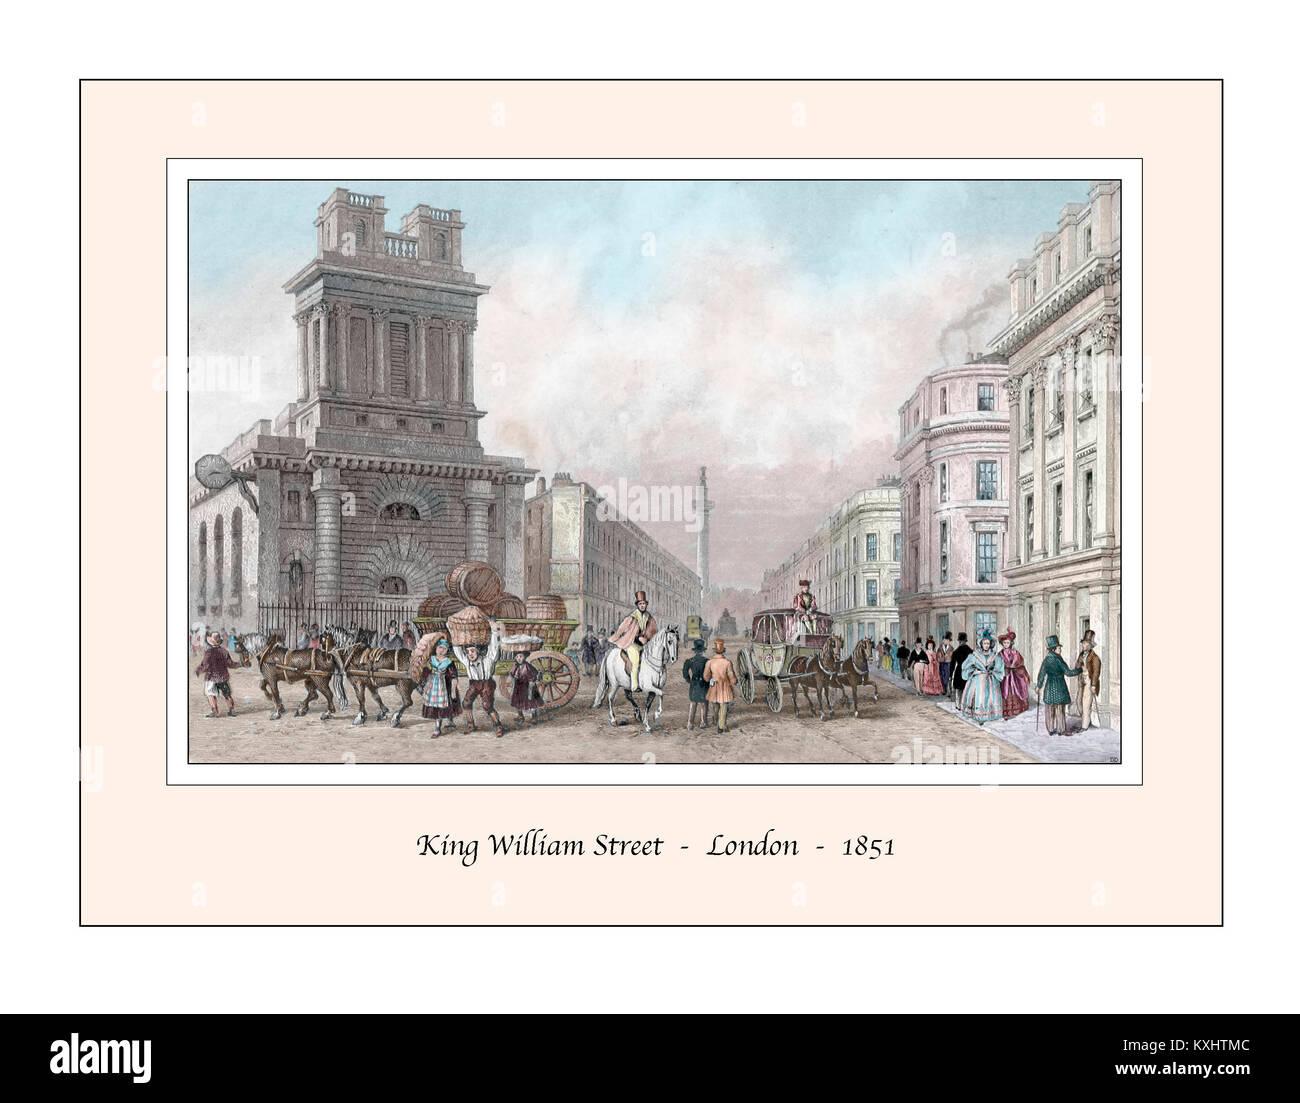 KIng William Street London Original Design based on a 19th century Engraving - Stock Image